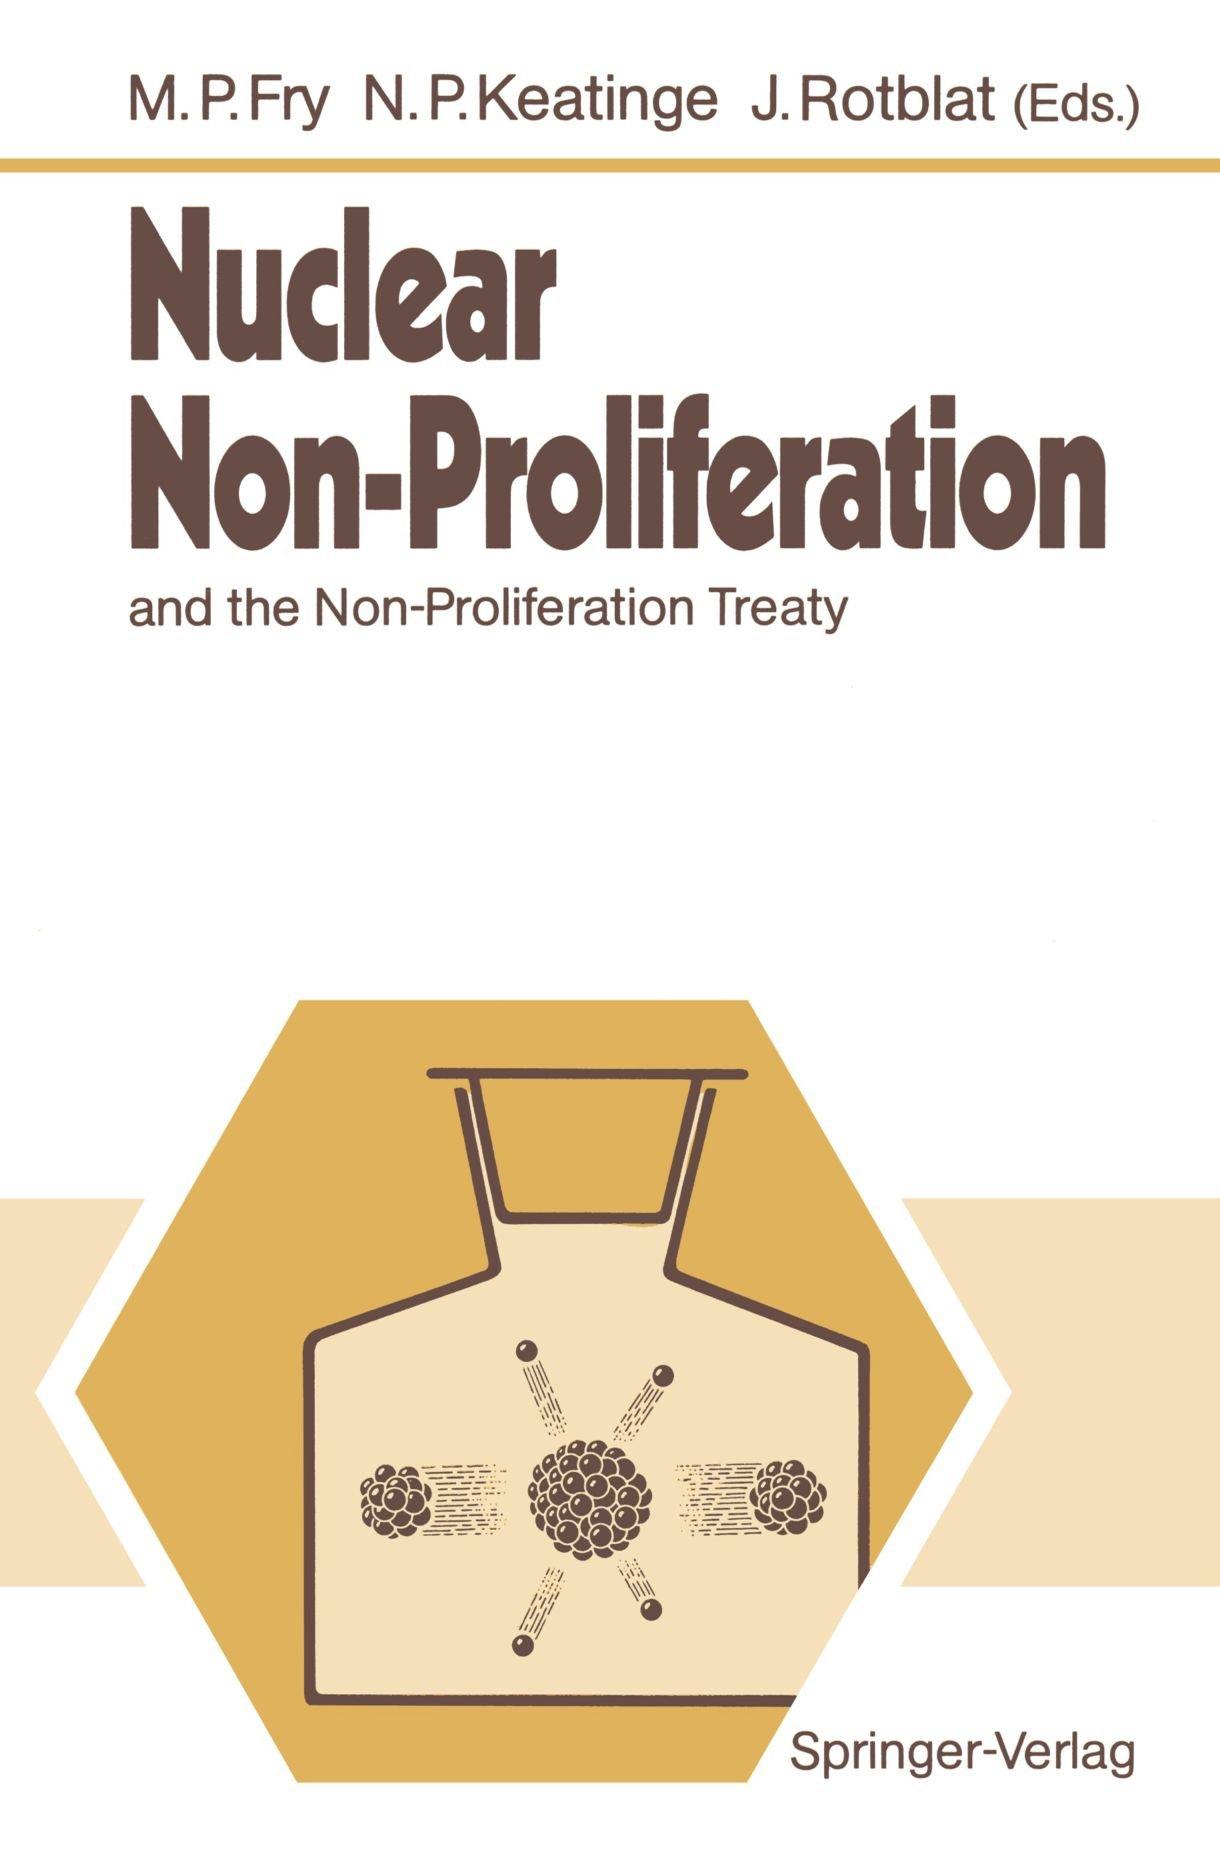 Nuclear Non-Proliferation: and the Non-Proliferation Treaty